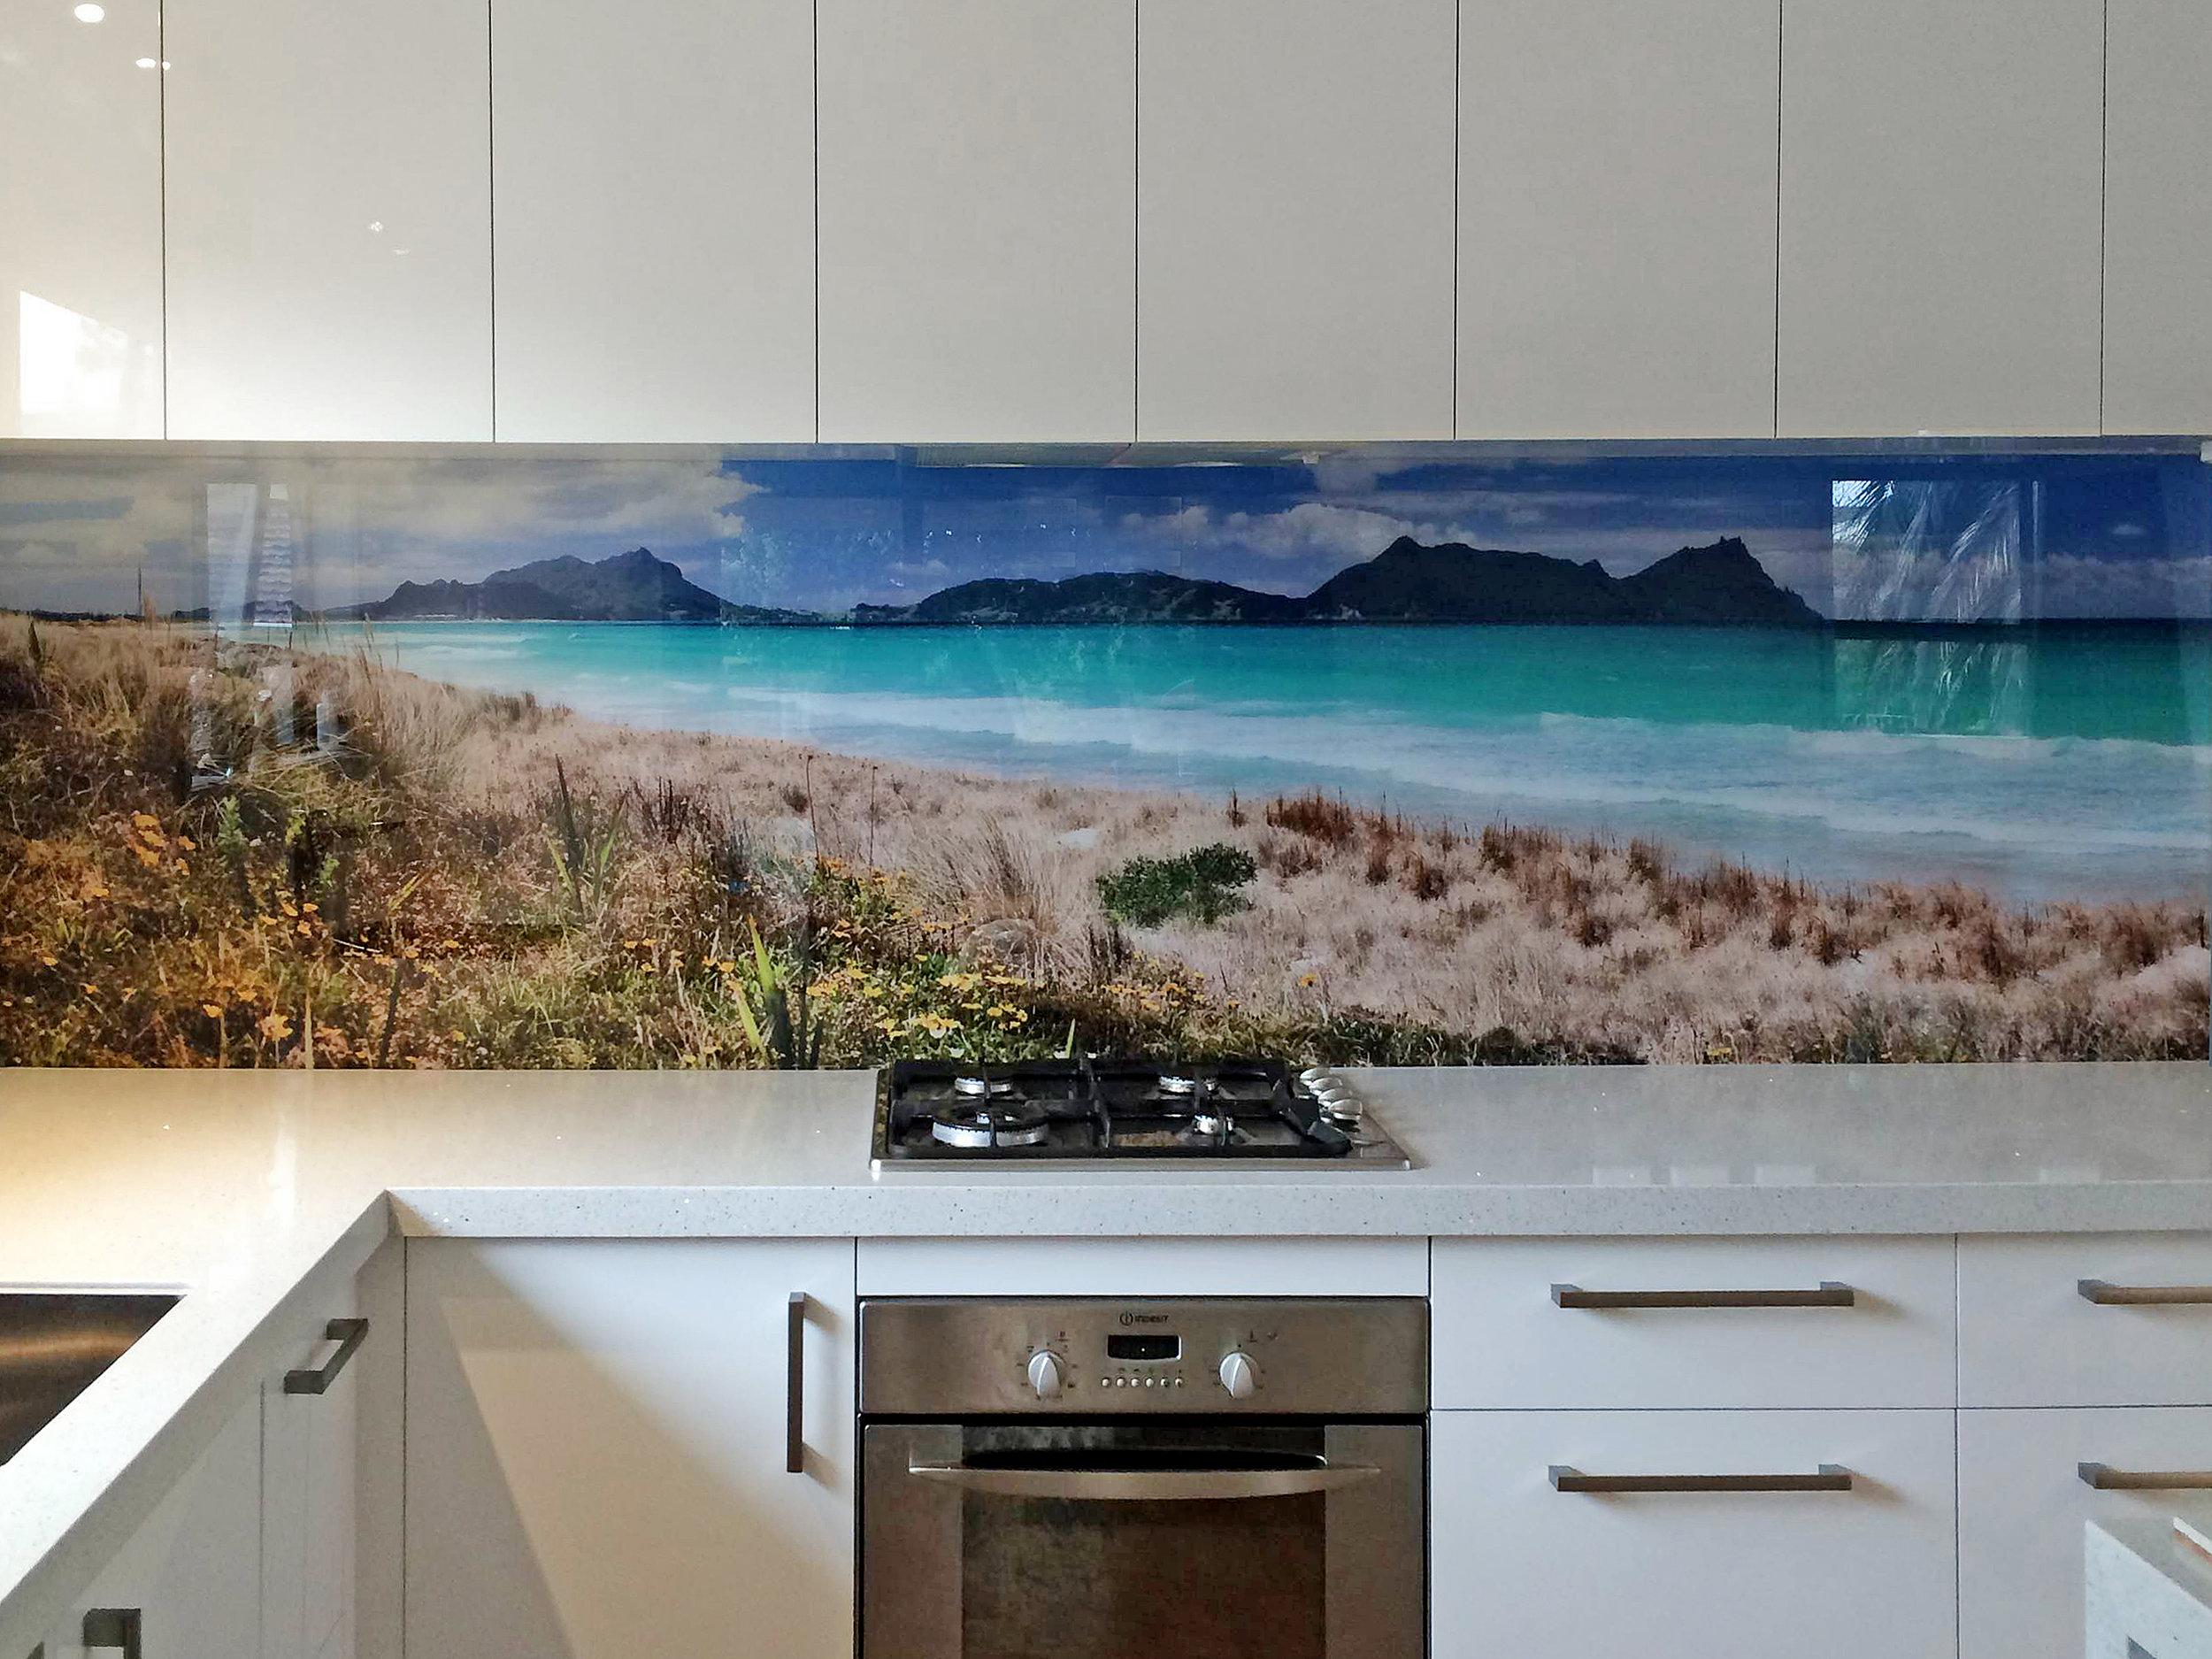 Ruakaka printed image on glass splashback